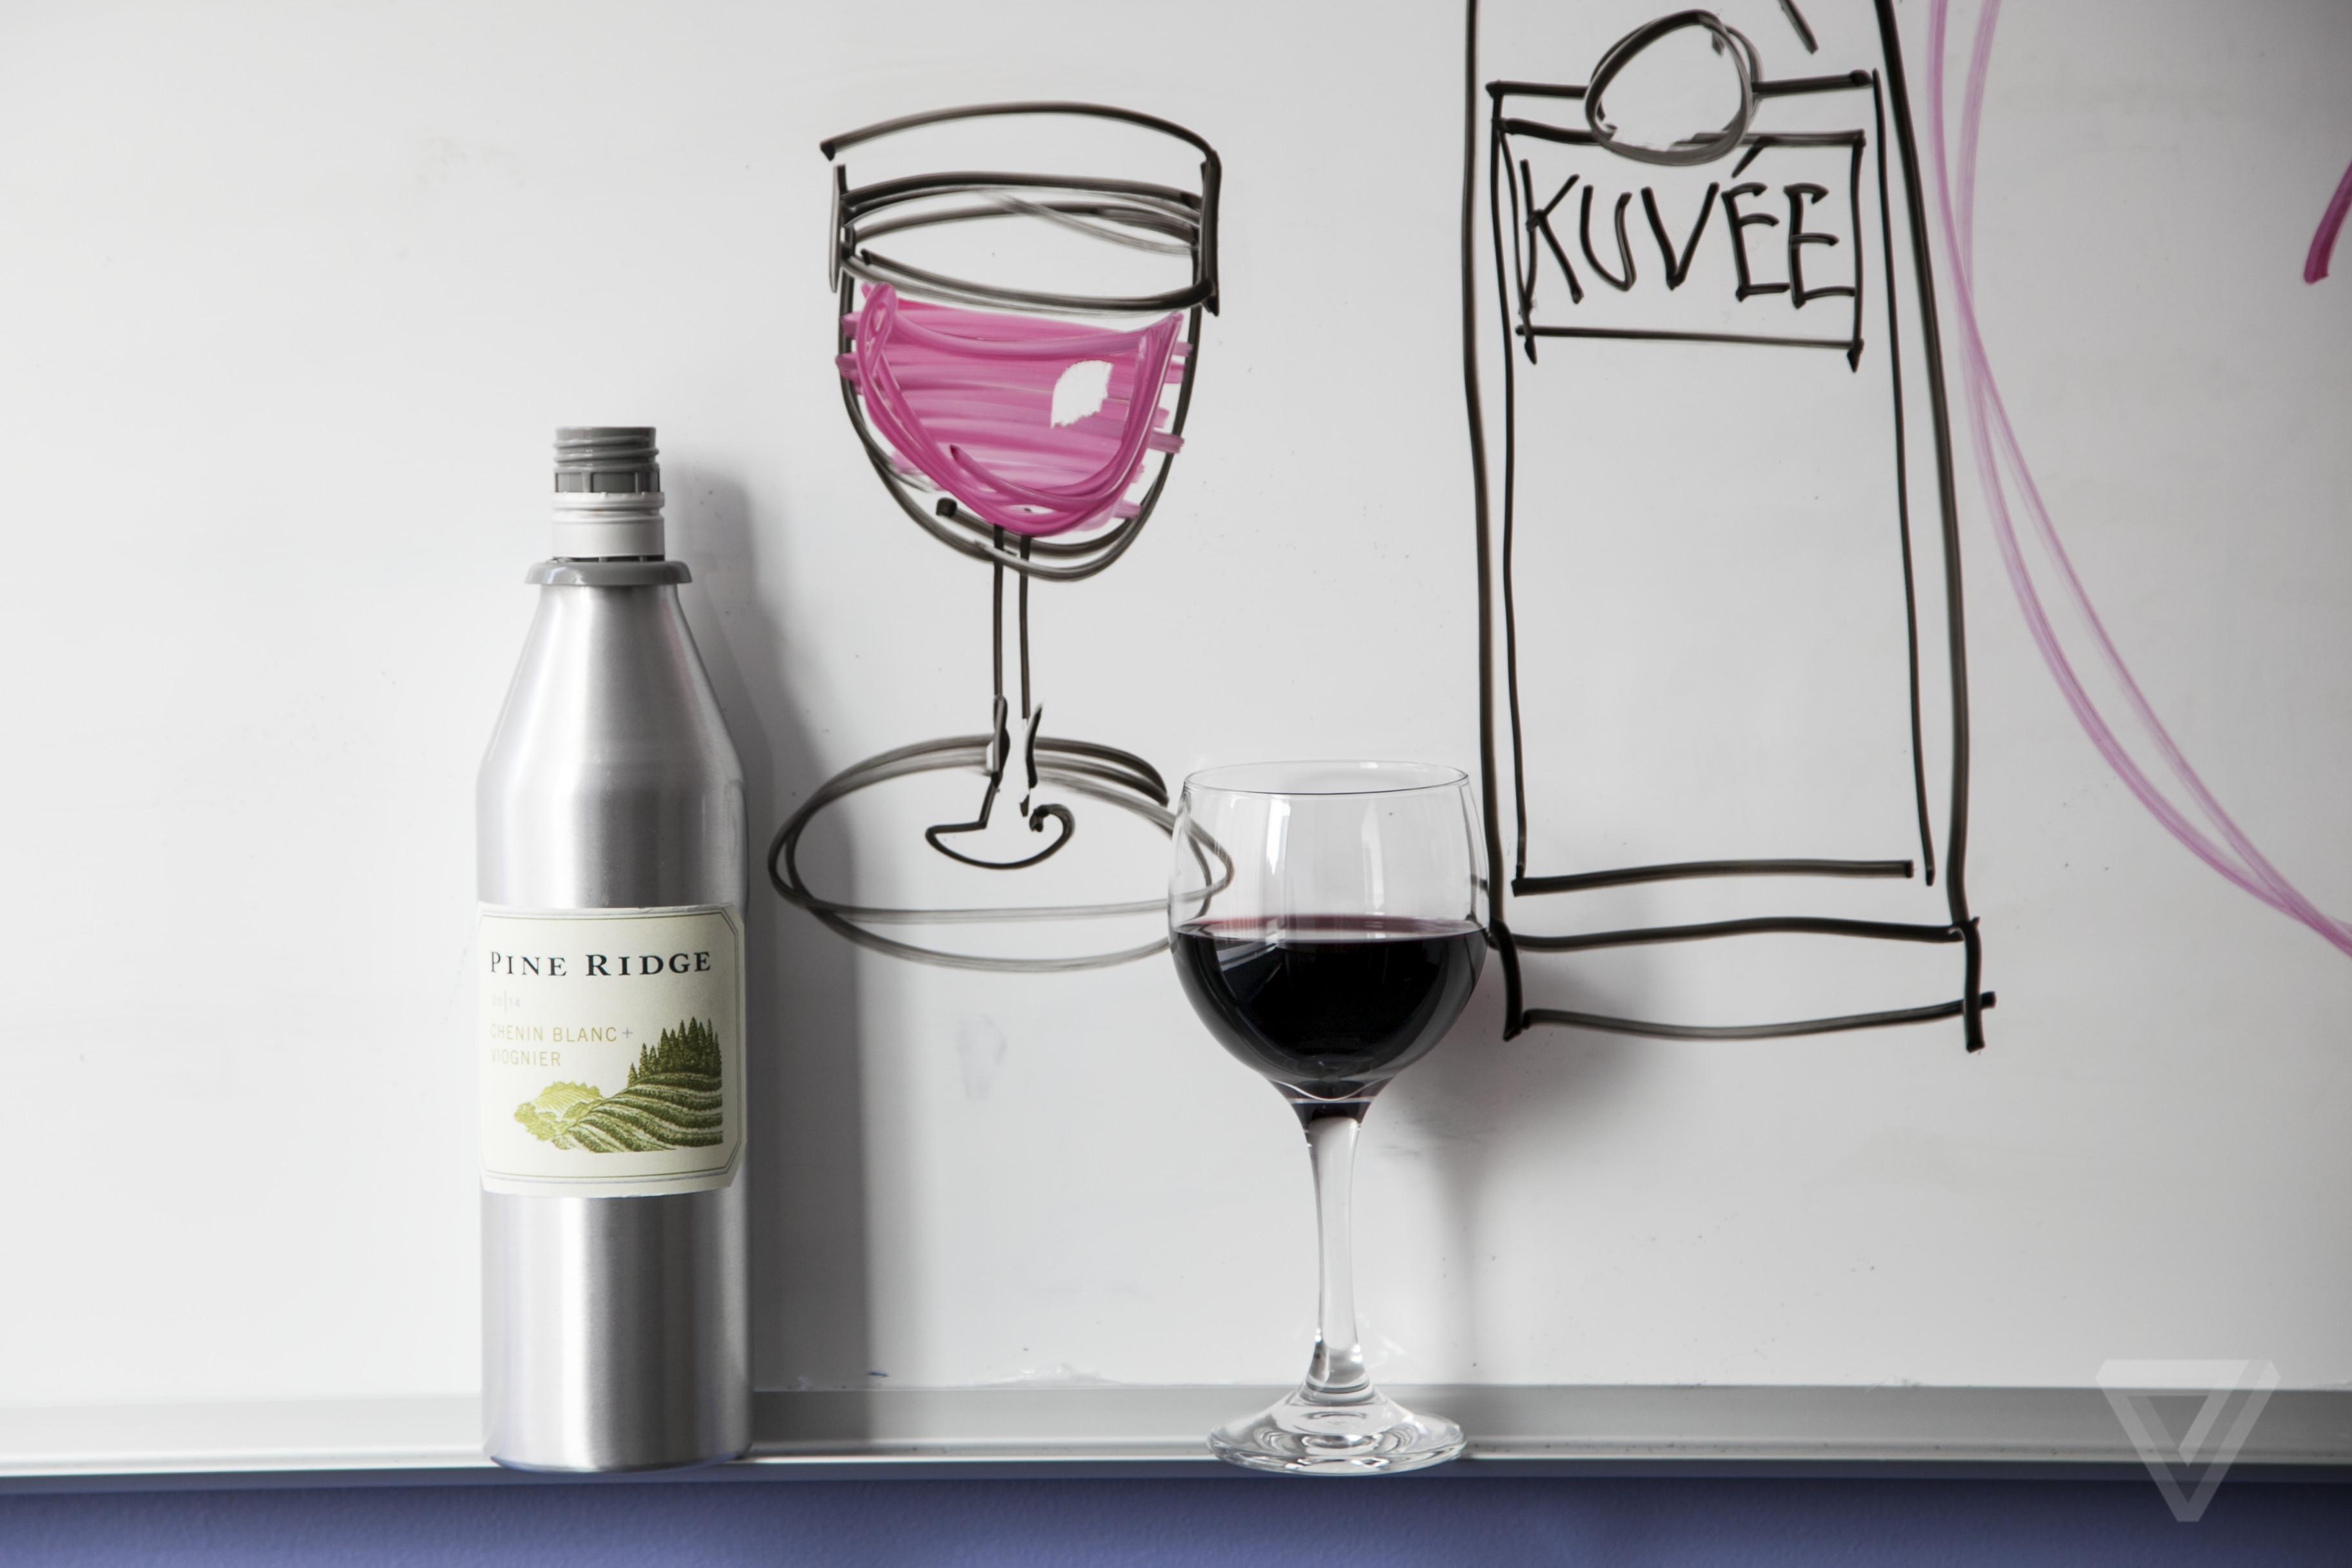 kuvee smart wine bottle-news-Amelia Krales/The Verge